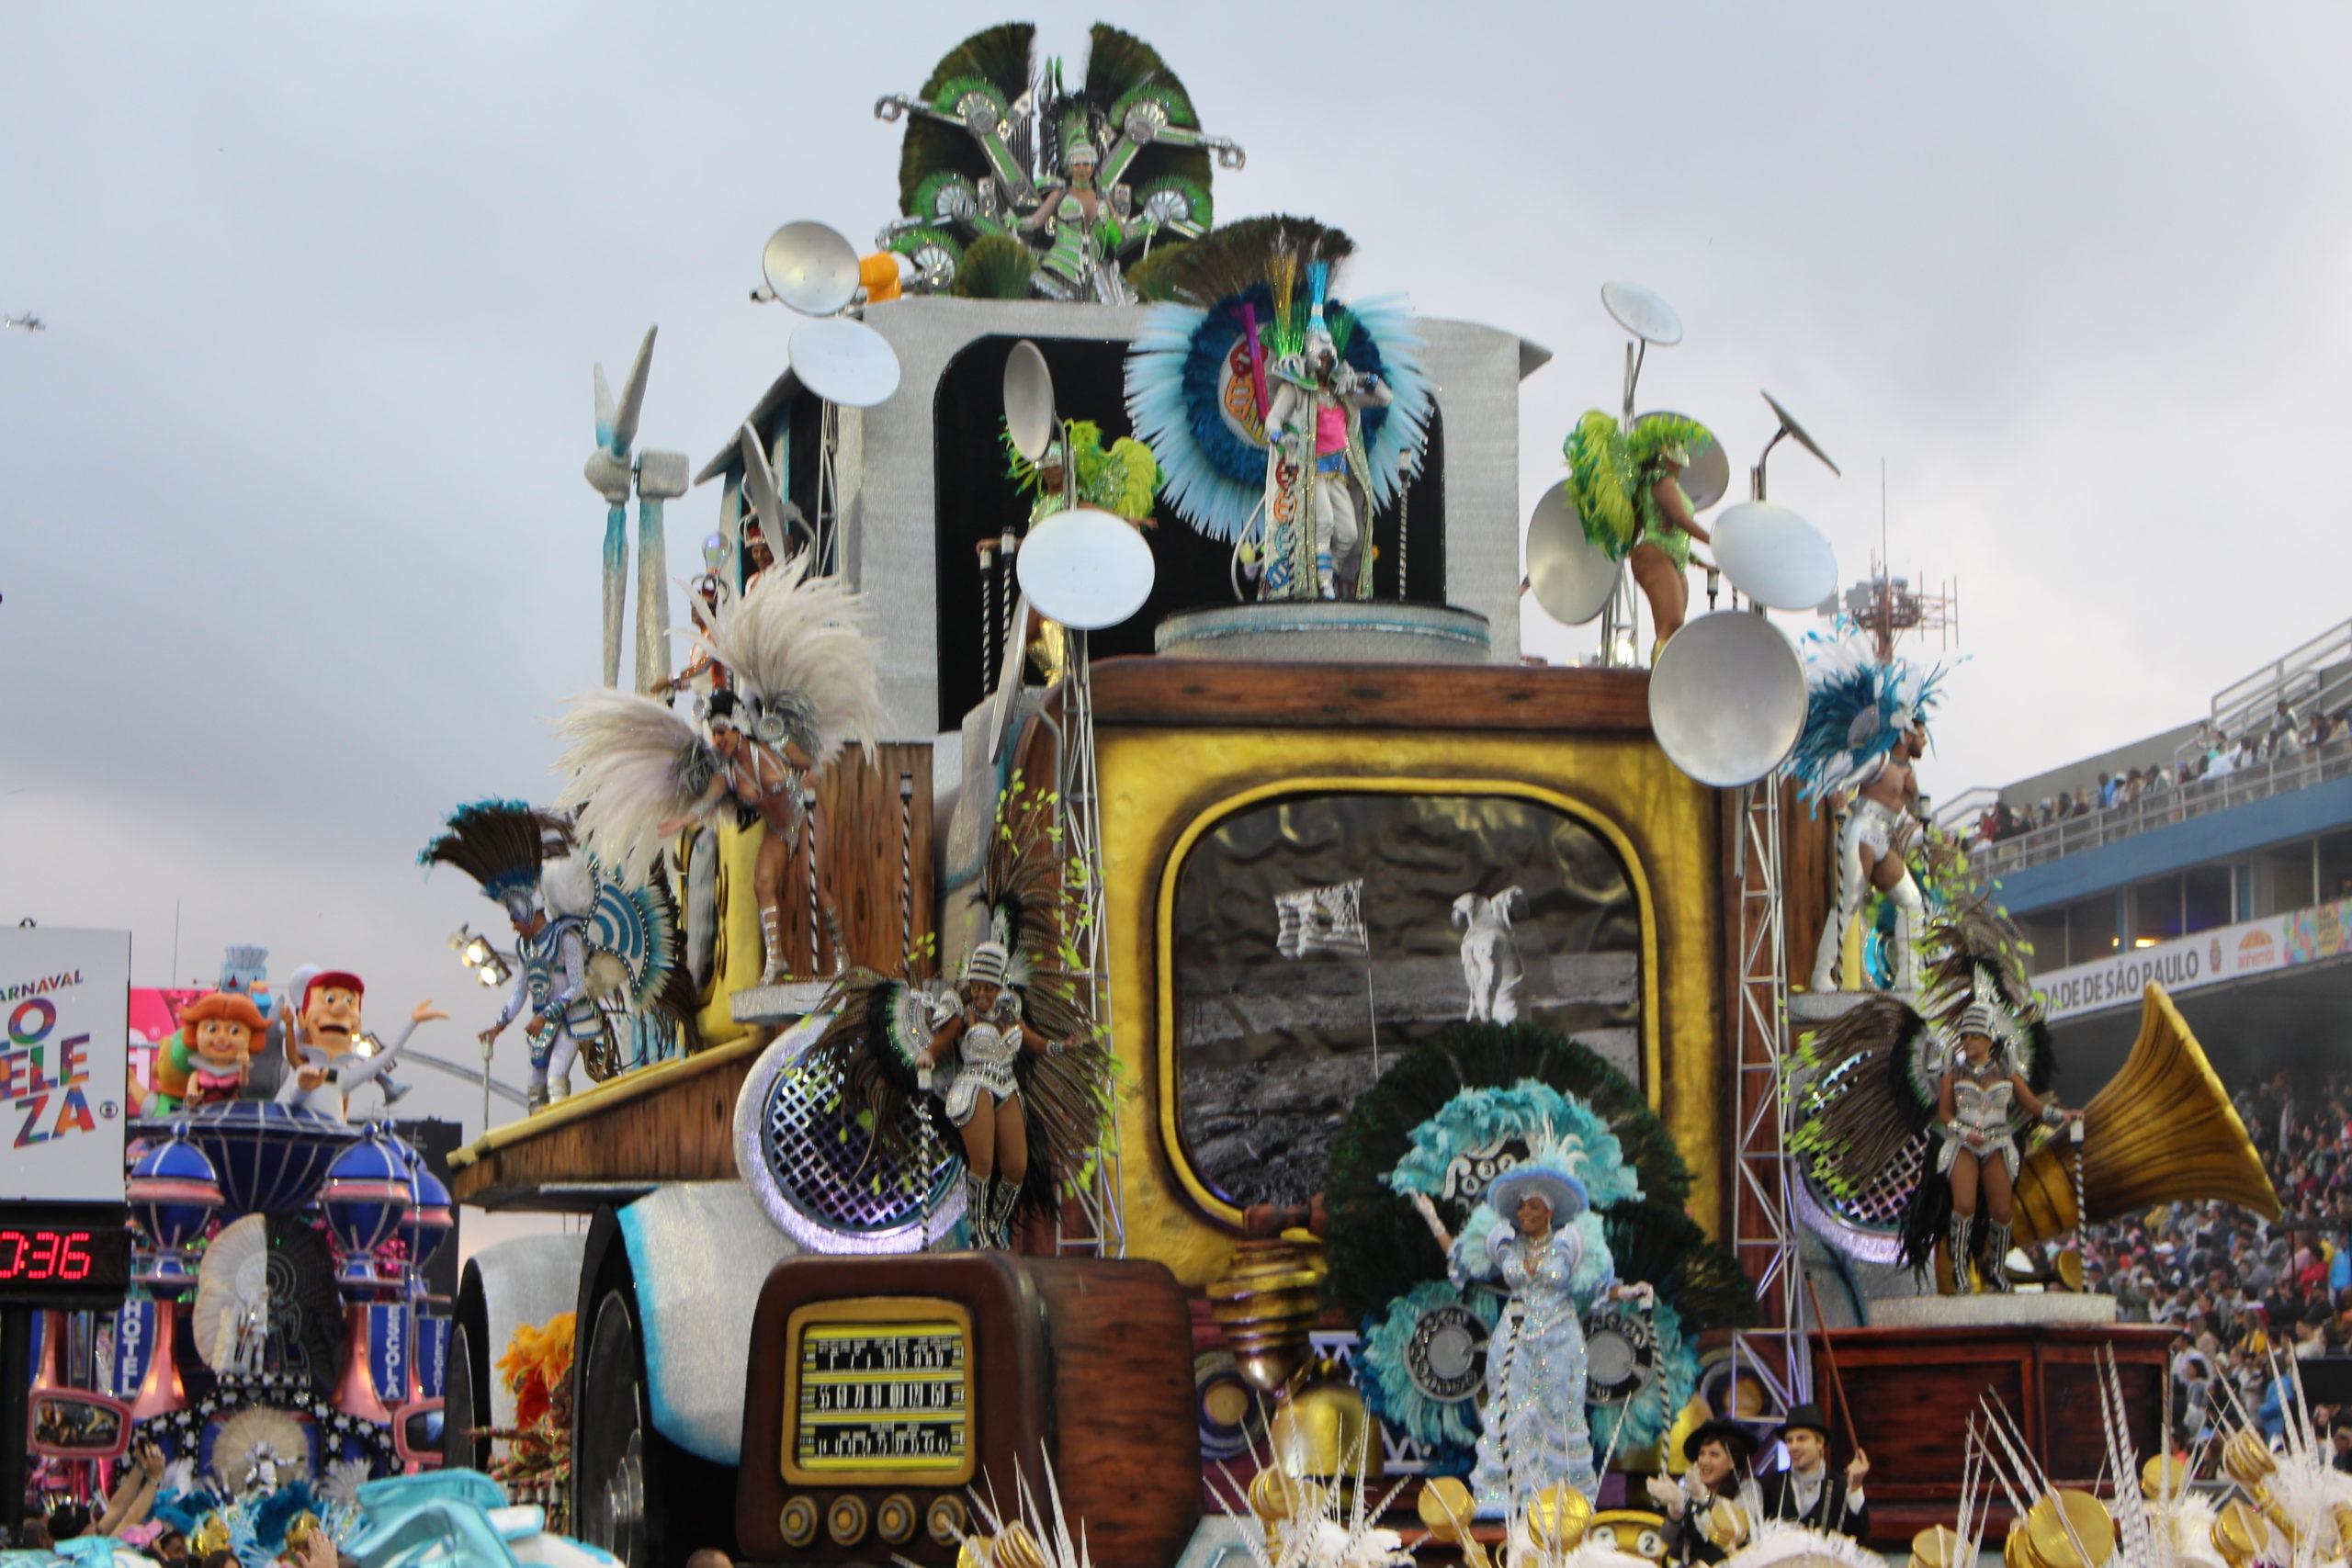 Sao Paulo samba school calls on robots to bring home carnival crown